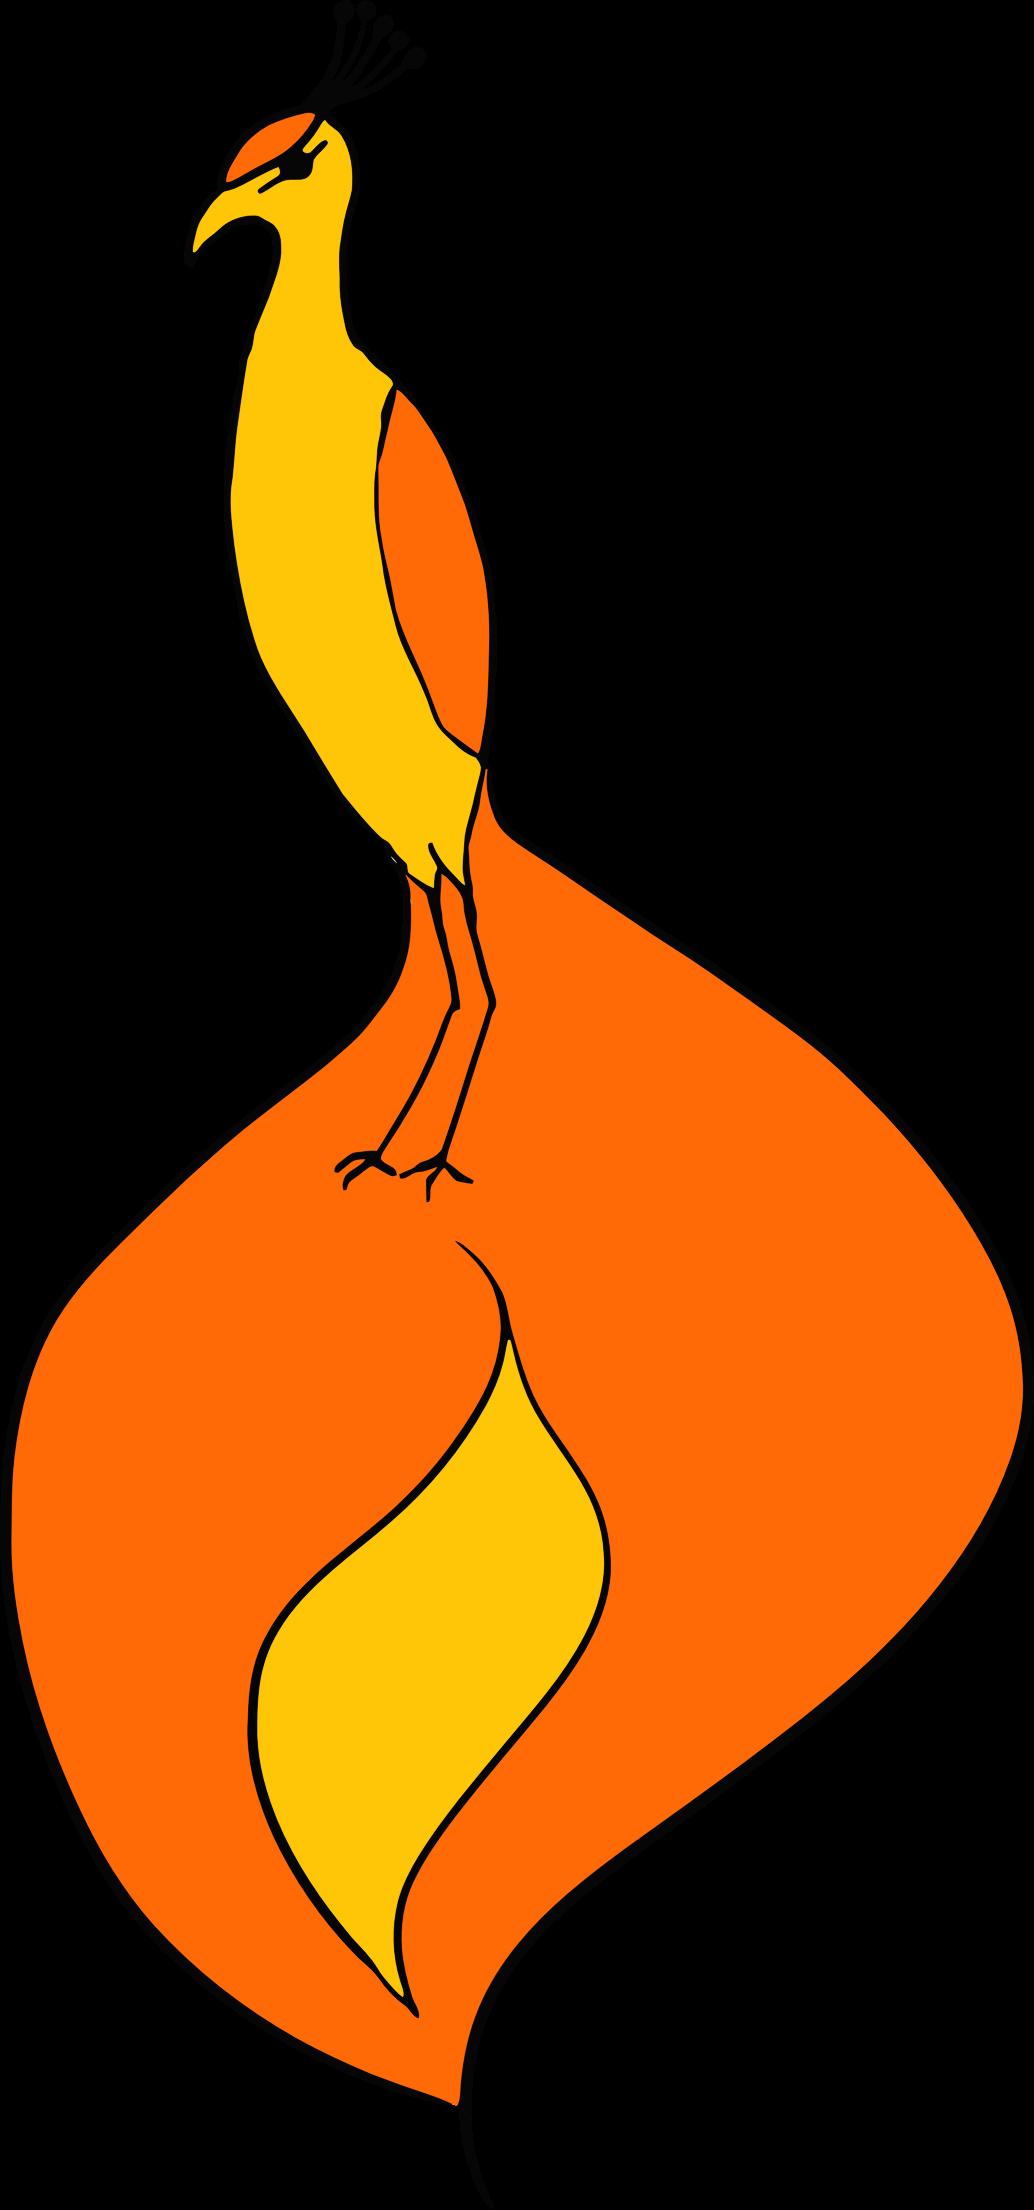 Phoenix bird big image. Thumb clipart fire